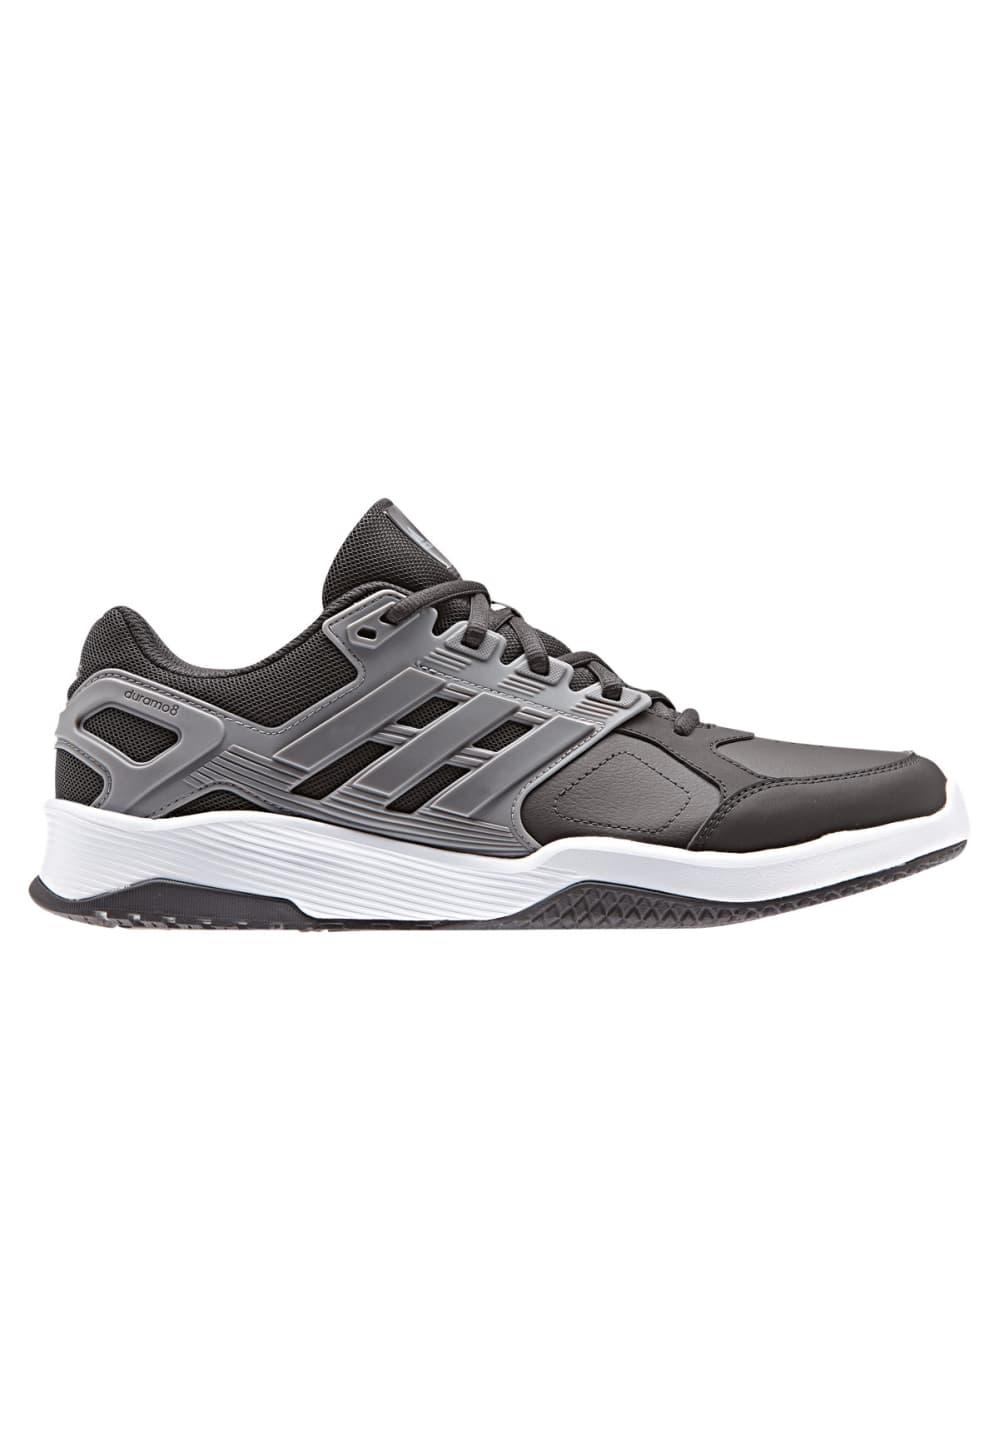 promo code 09602 24ebe adidas-duramo-8-trainer-fitnessschuhe-herren-grau-pid-000000000010136459.jpg